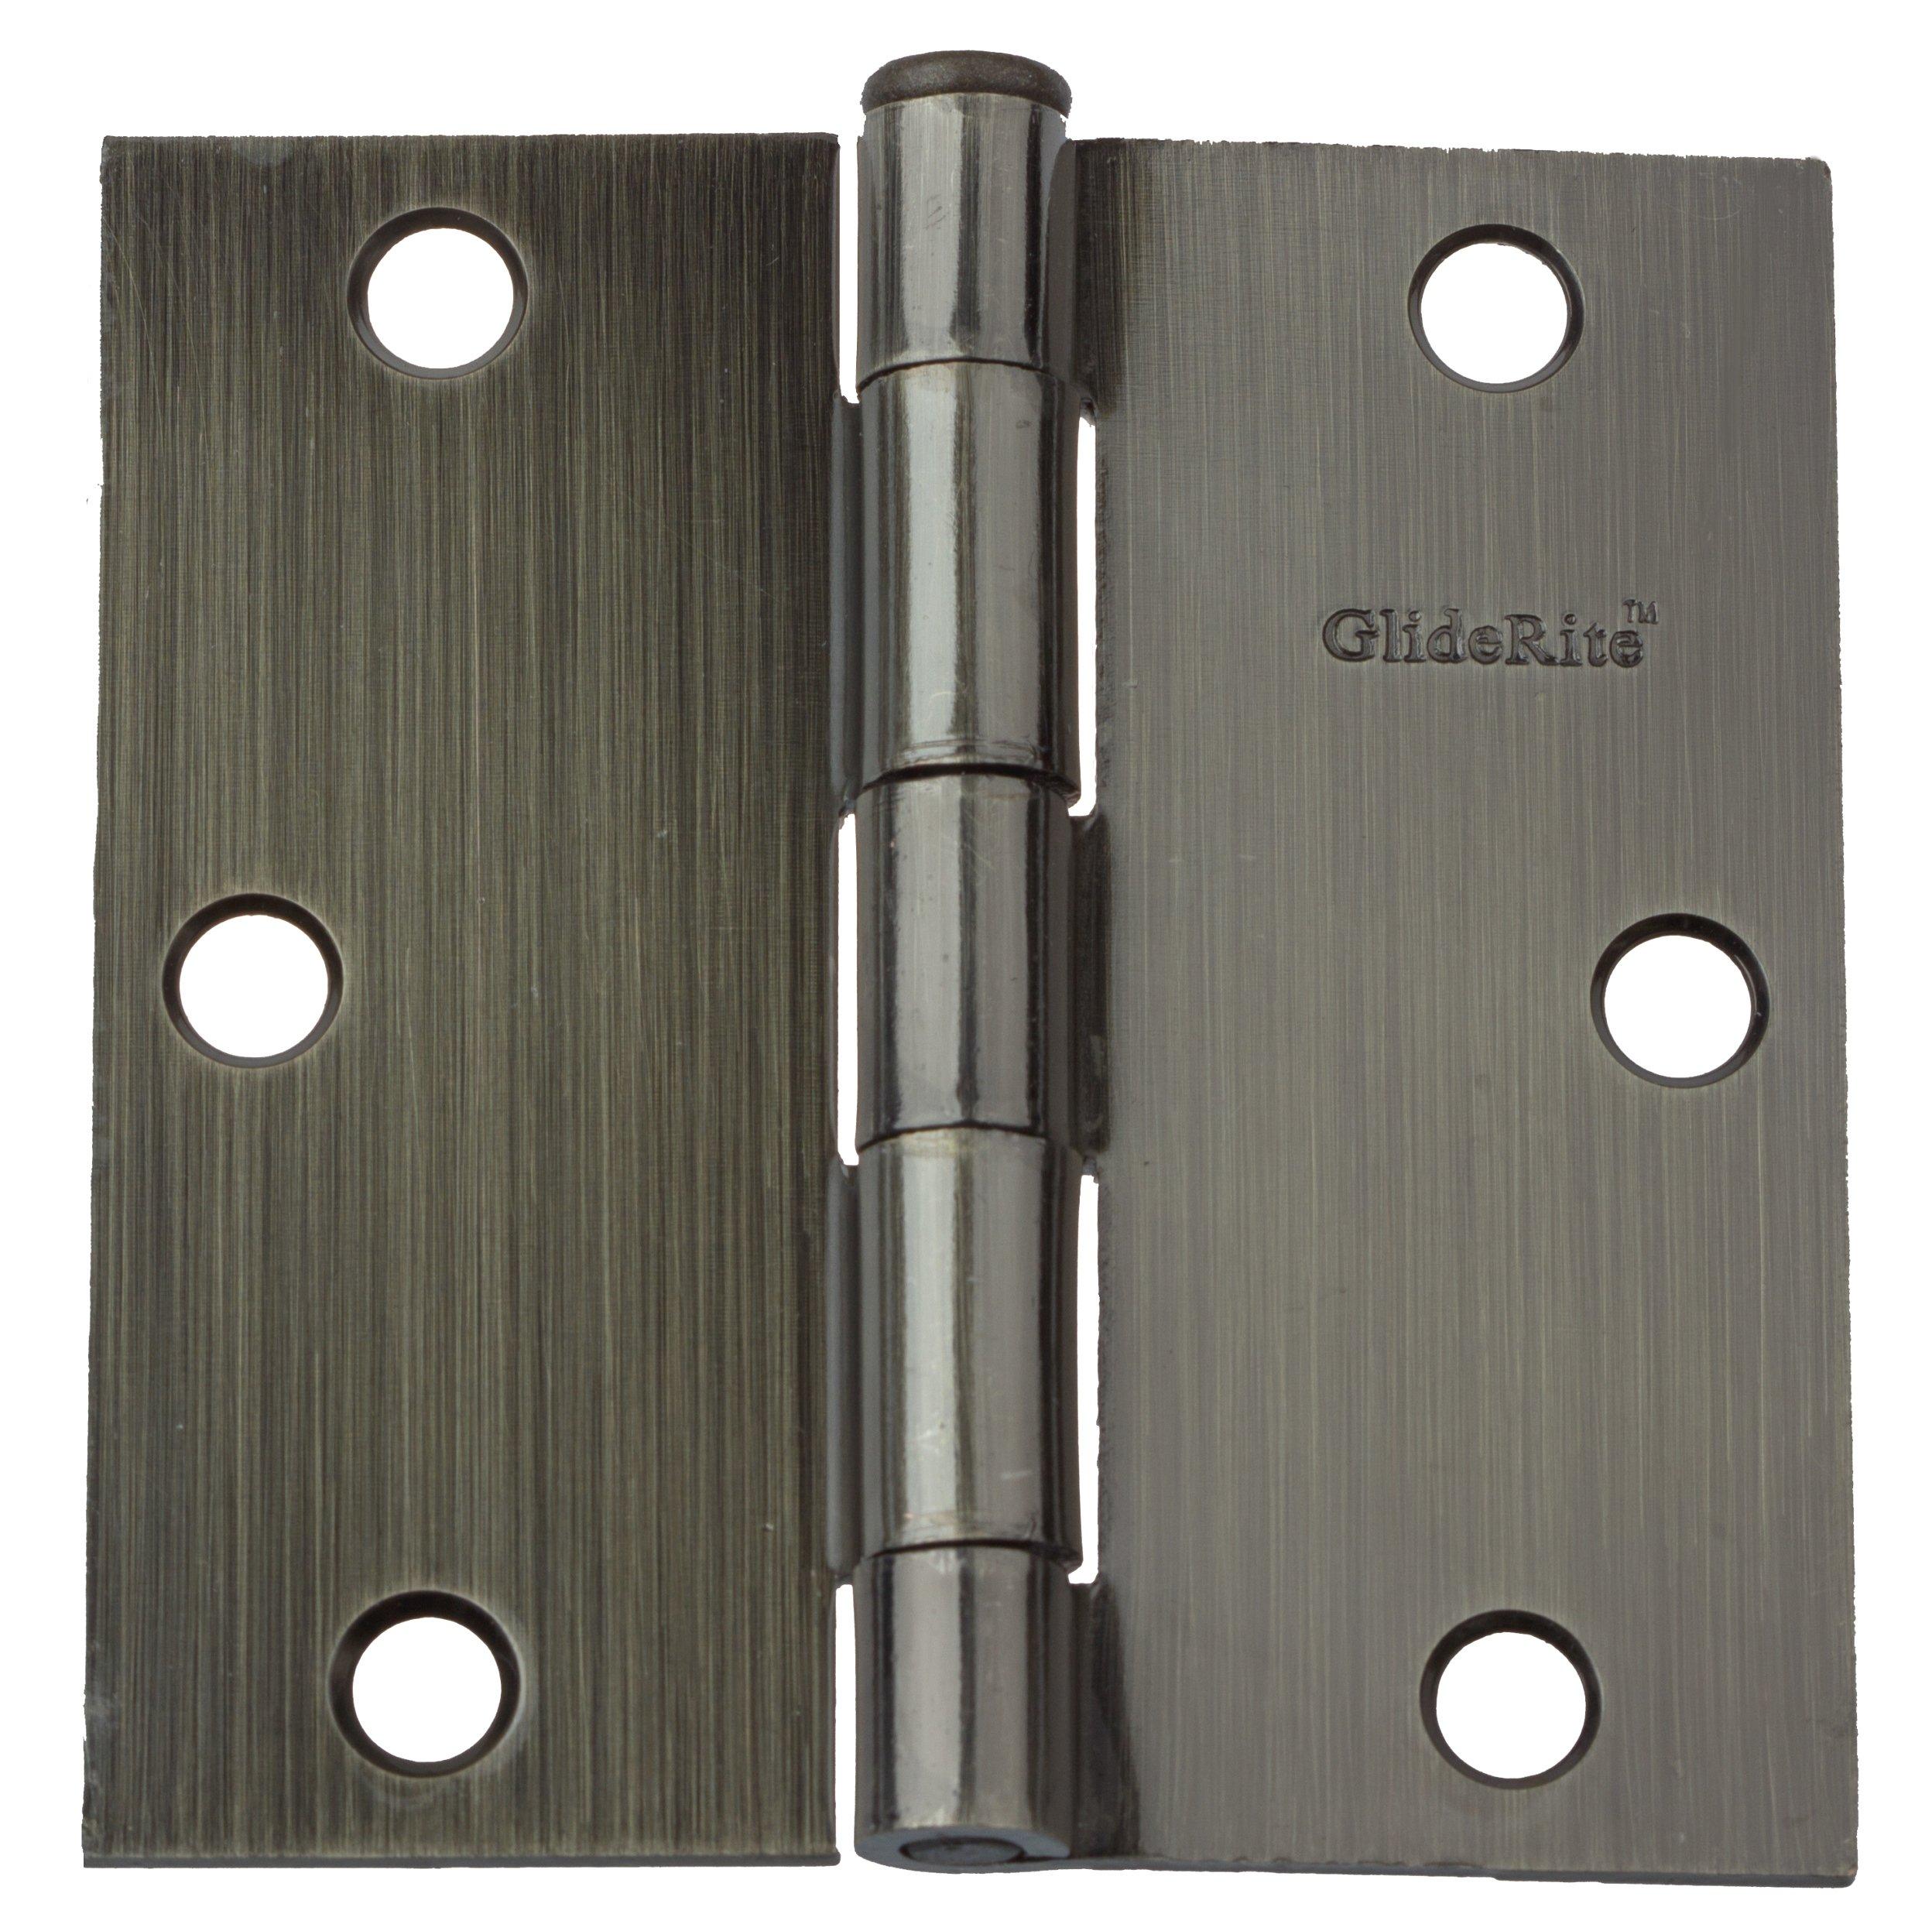 GlideRite Hardware 3500-AB-21 3.5 inch steel Door Hinges Square Corners Antique Brass Finish 21 Pack